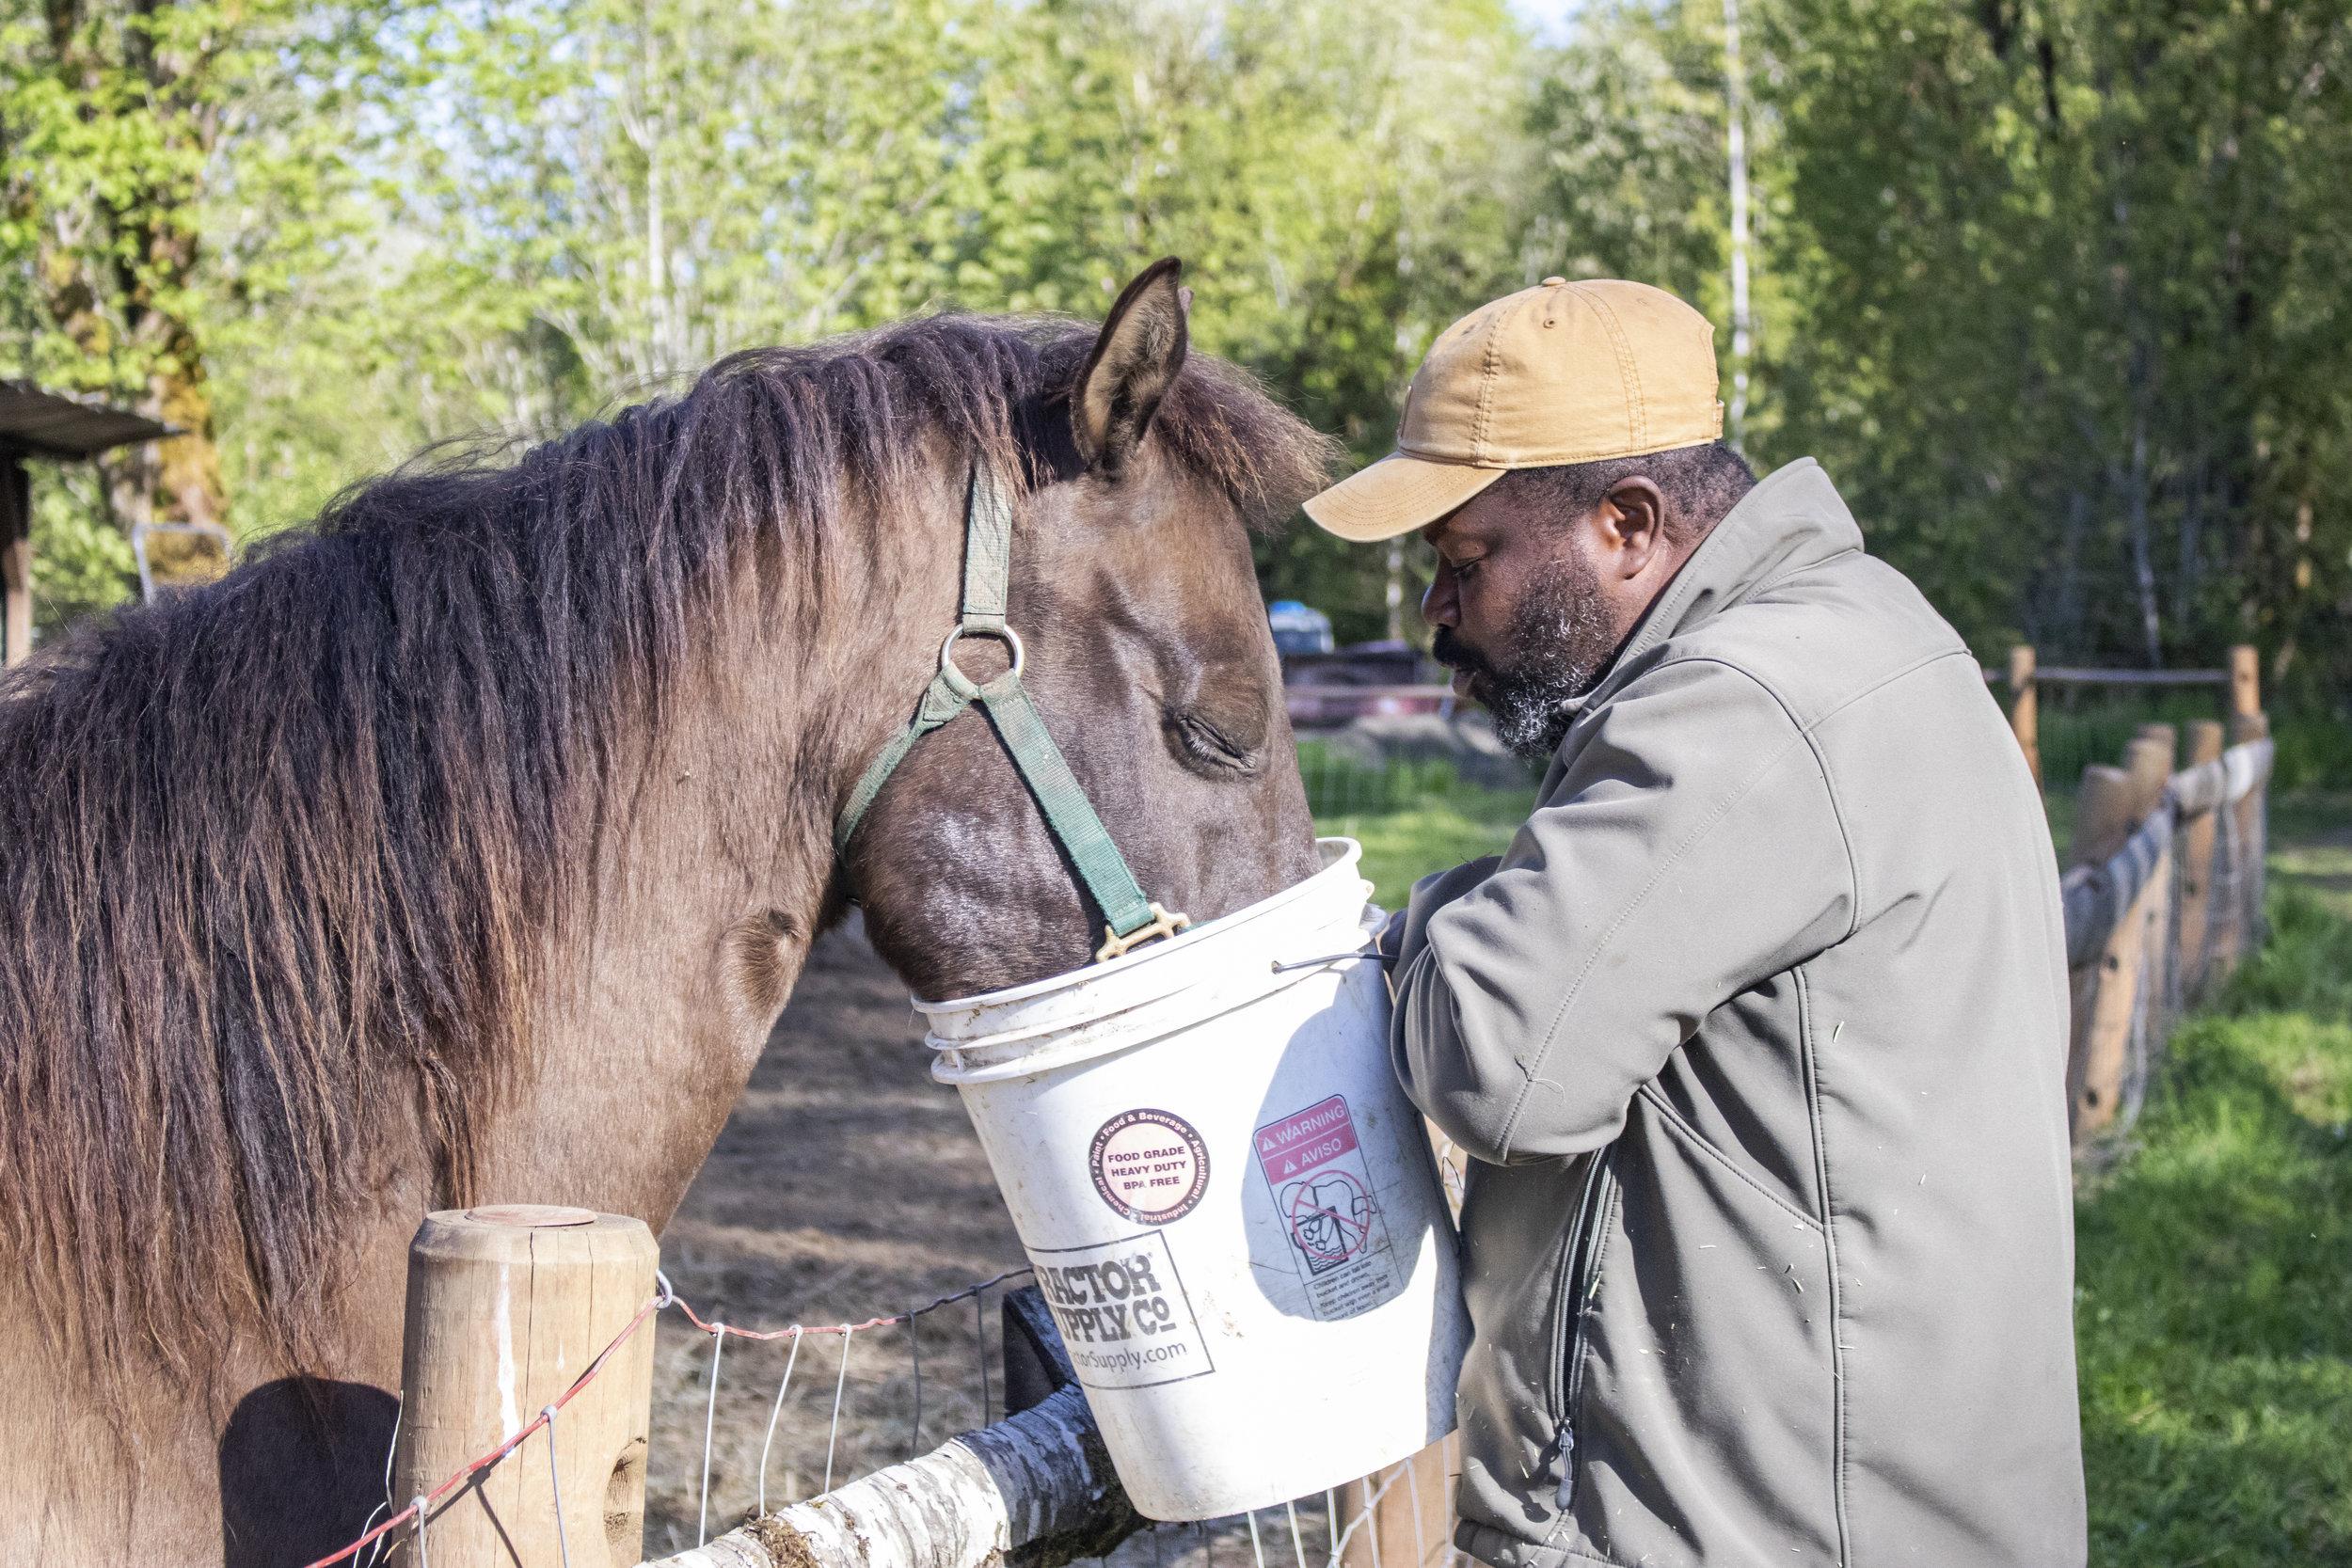 rohn_feeding_horse.jpg